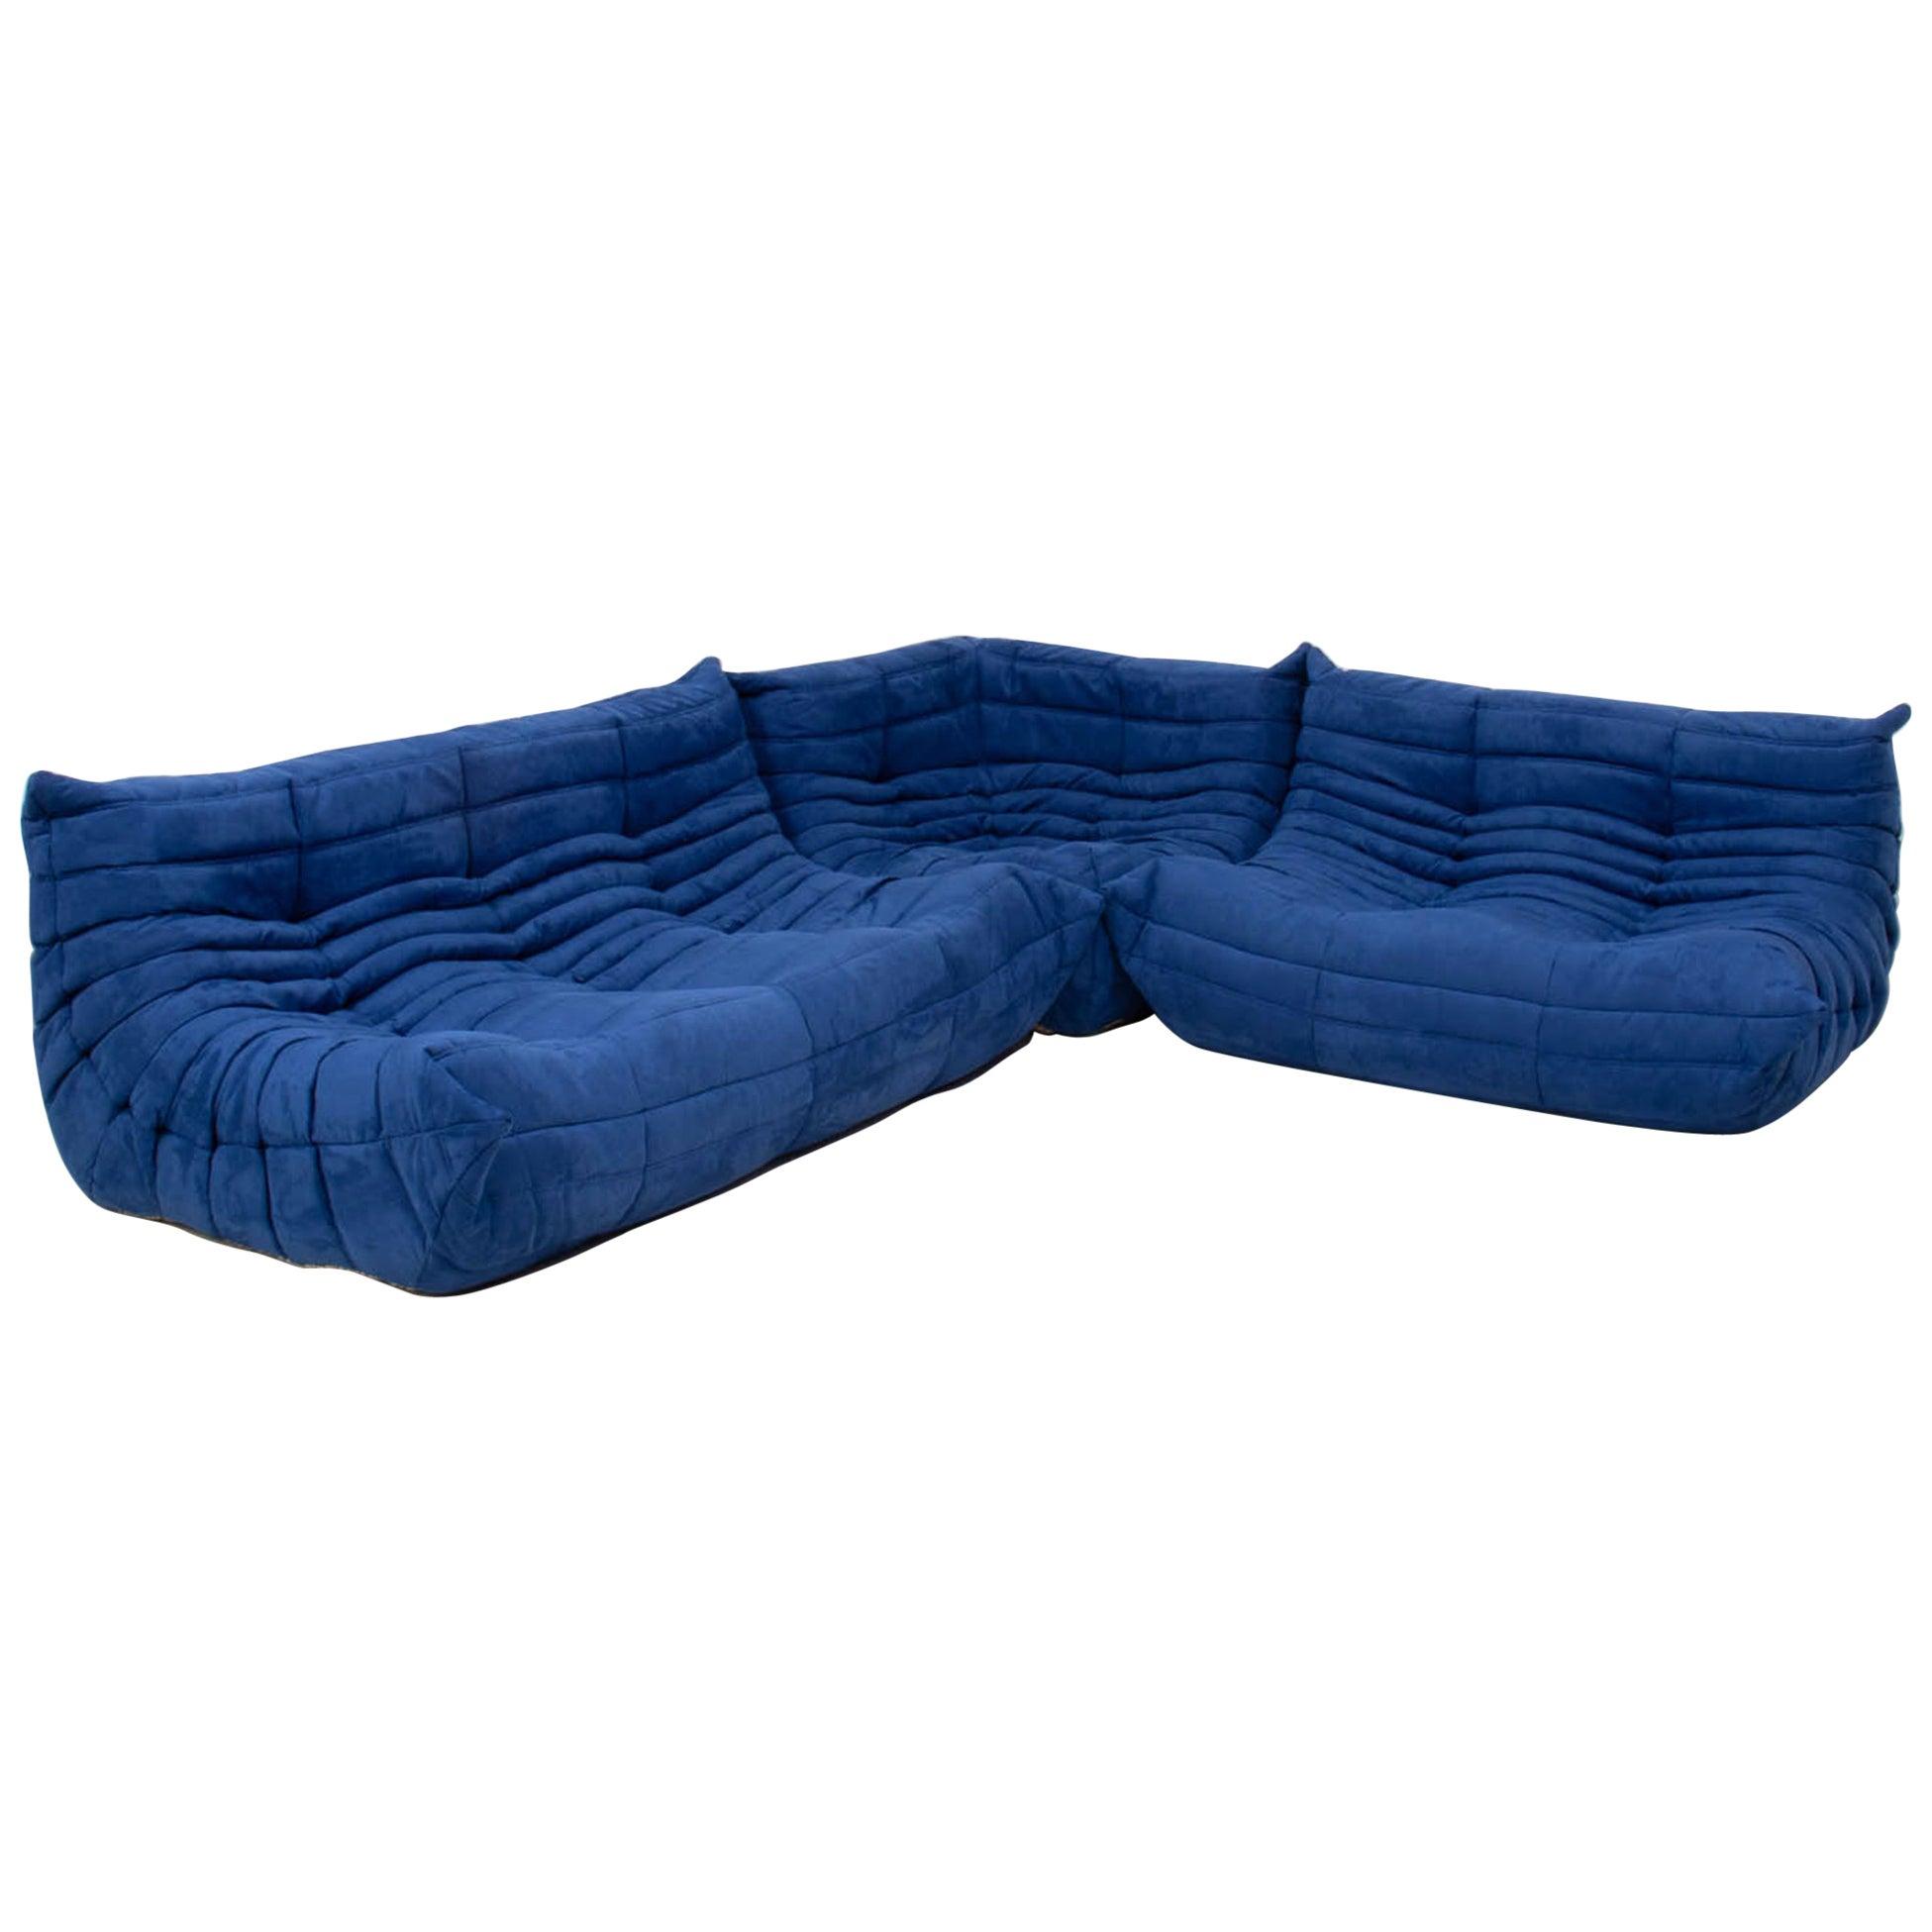 Michel Ducaroy for Ligne Roset Togo Blue Modular Sofa, Set of 3